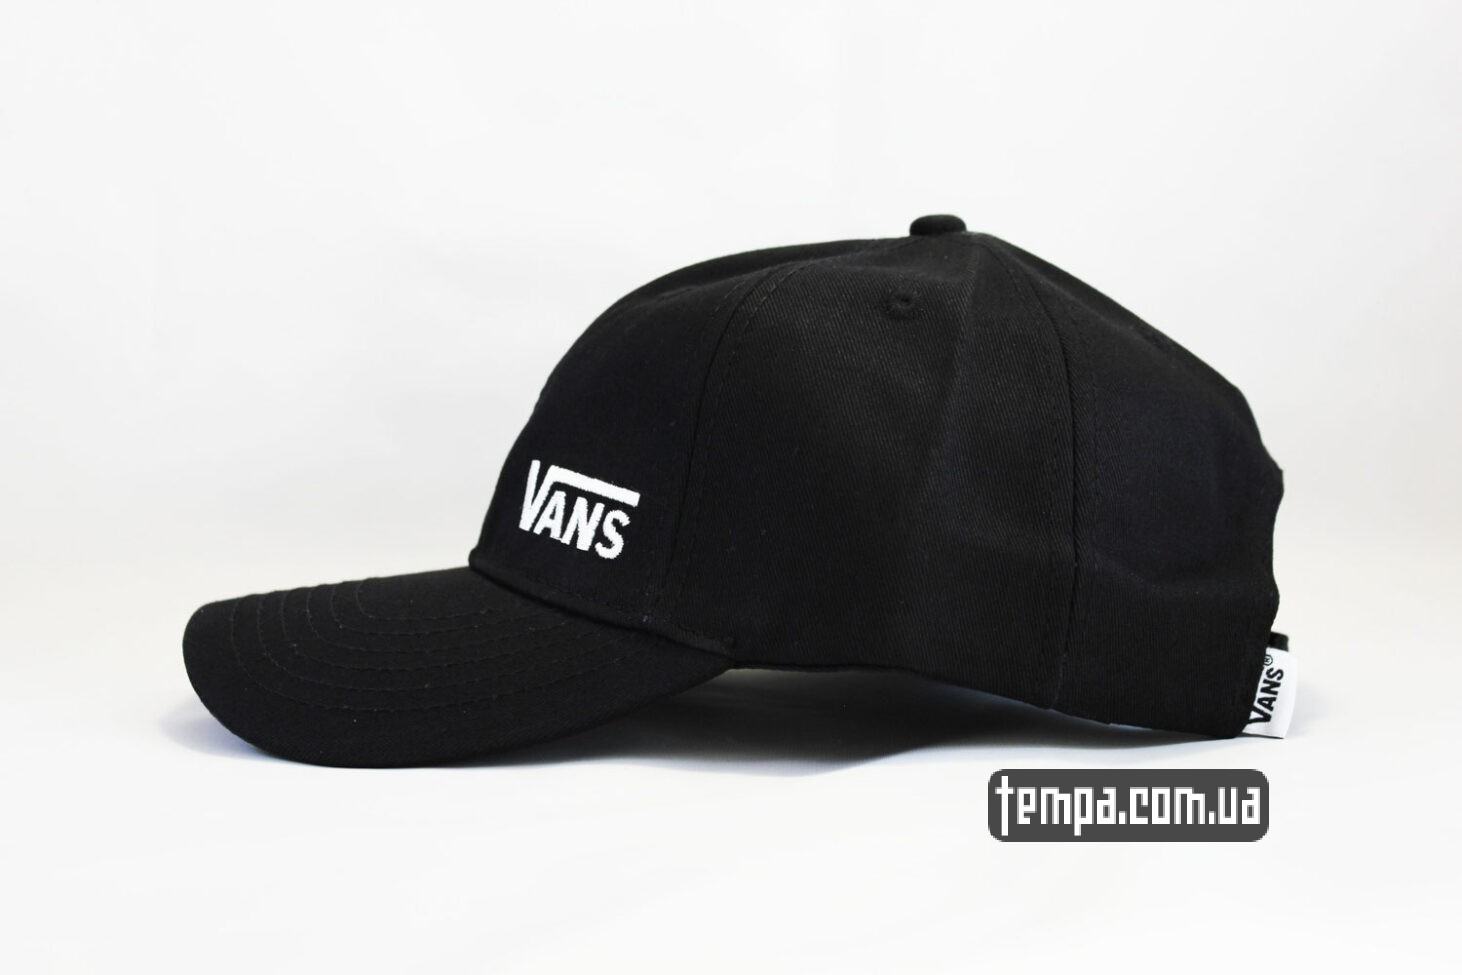 vans off the wall ukraine кепка VANS black логотип сбоку черная бейсболка